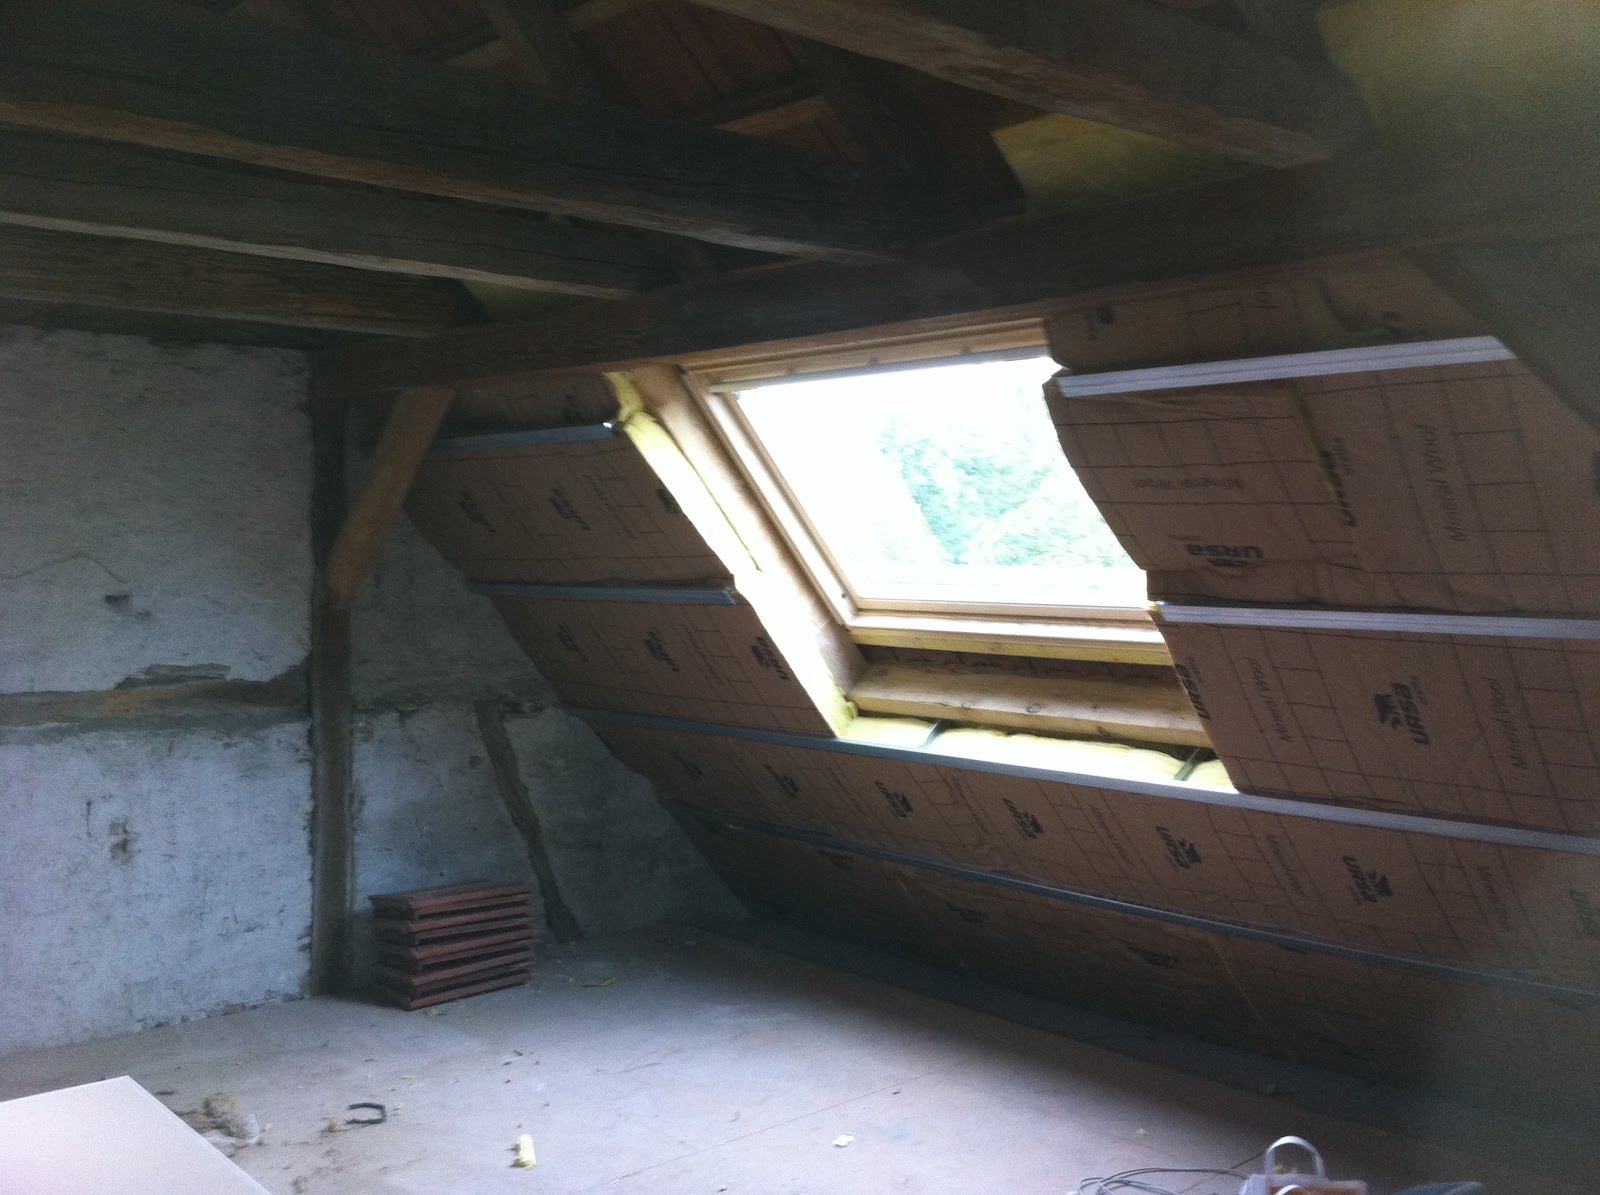 Maison petit landau photos - Ossature plafond rampant ...